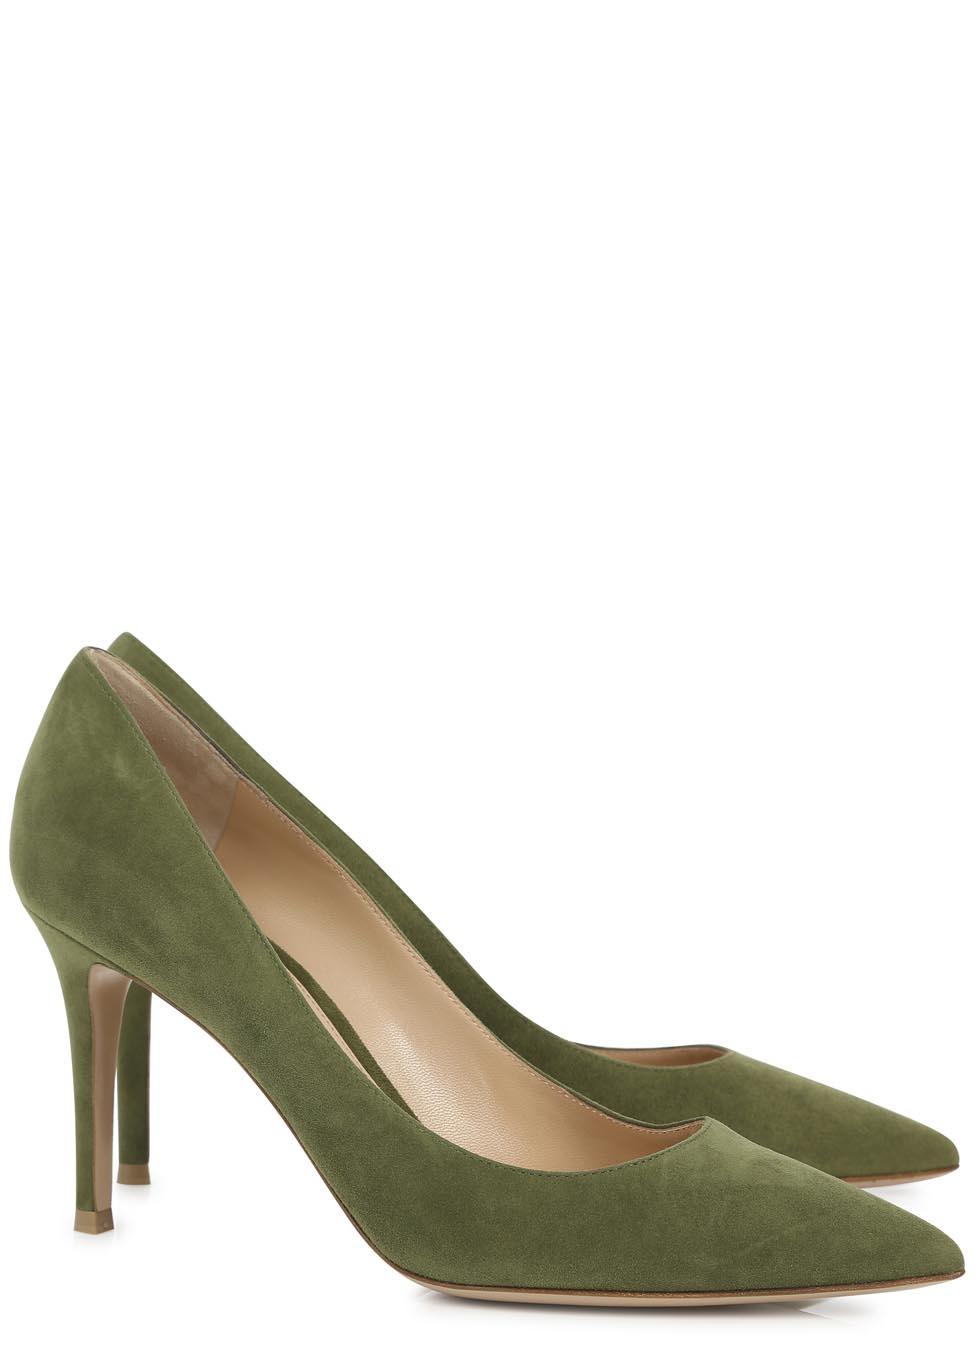 85 Suede Pumps - Green Gianvito Rossi AsA2RvAou5